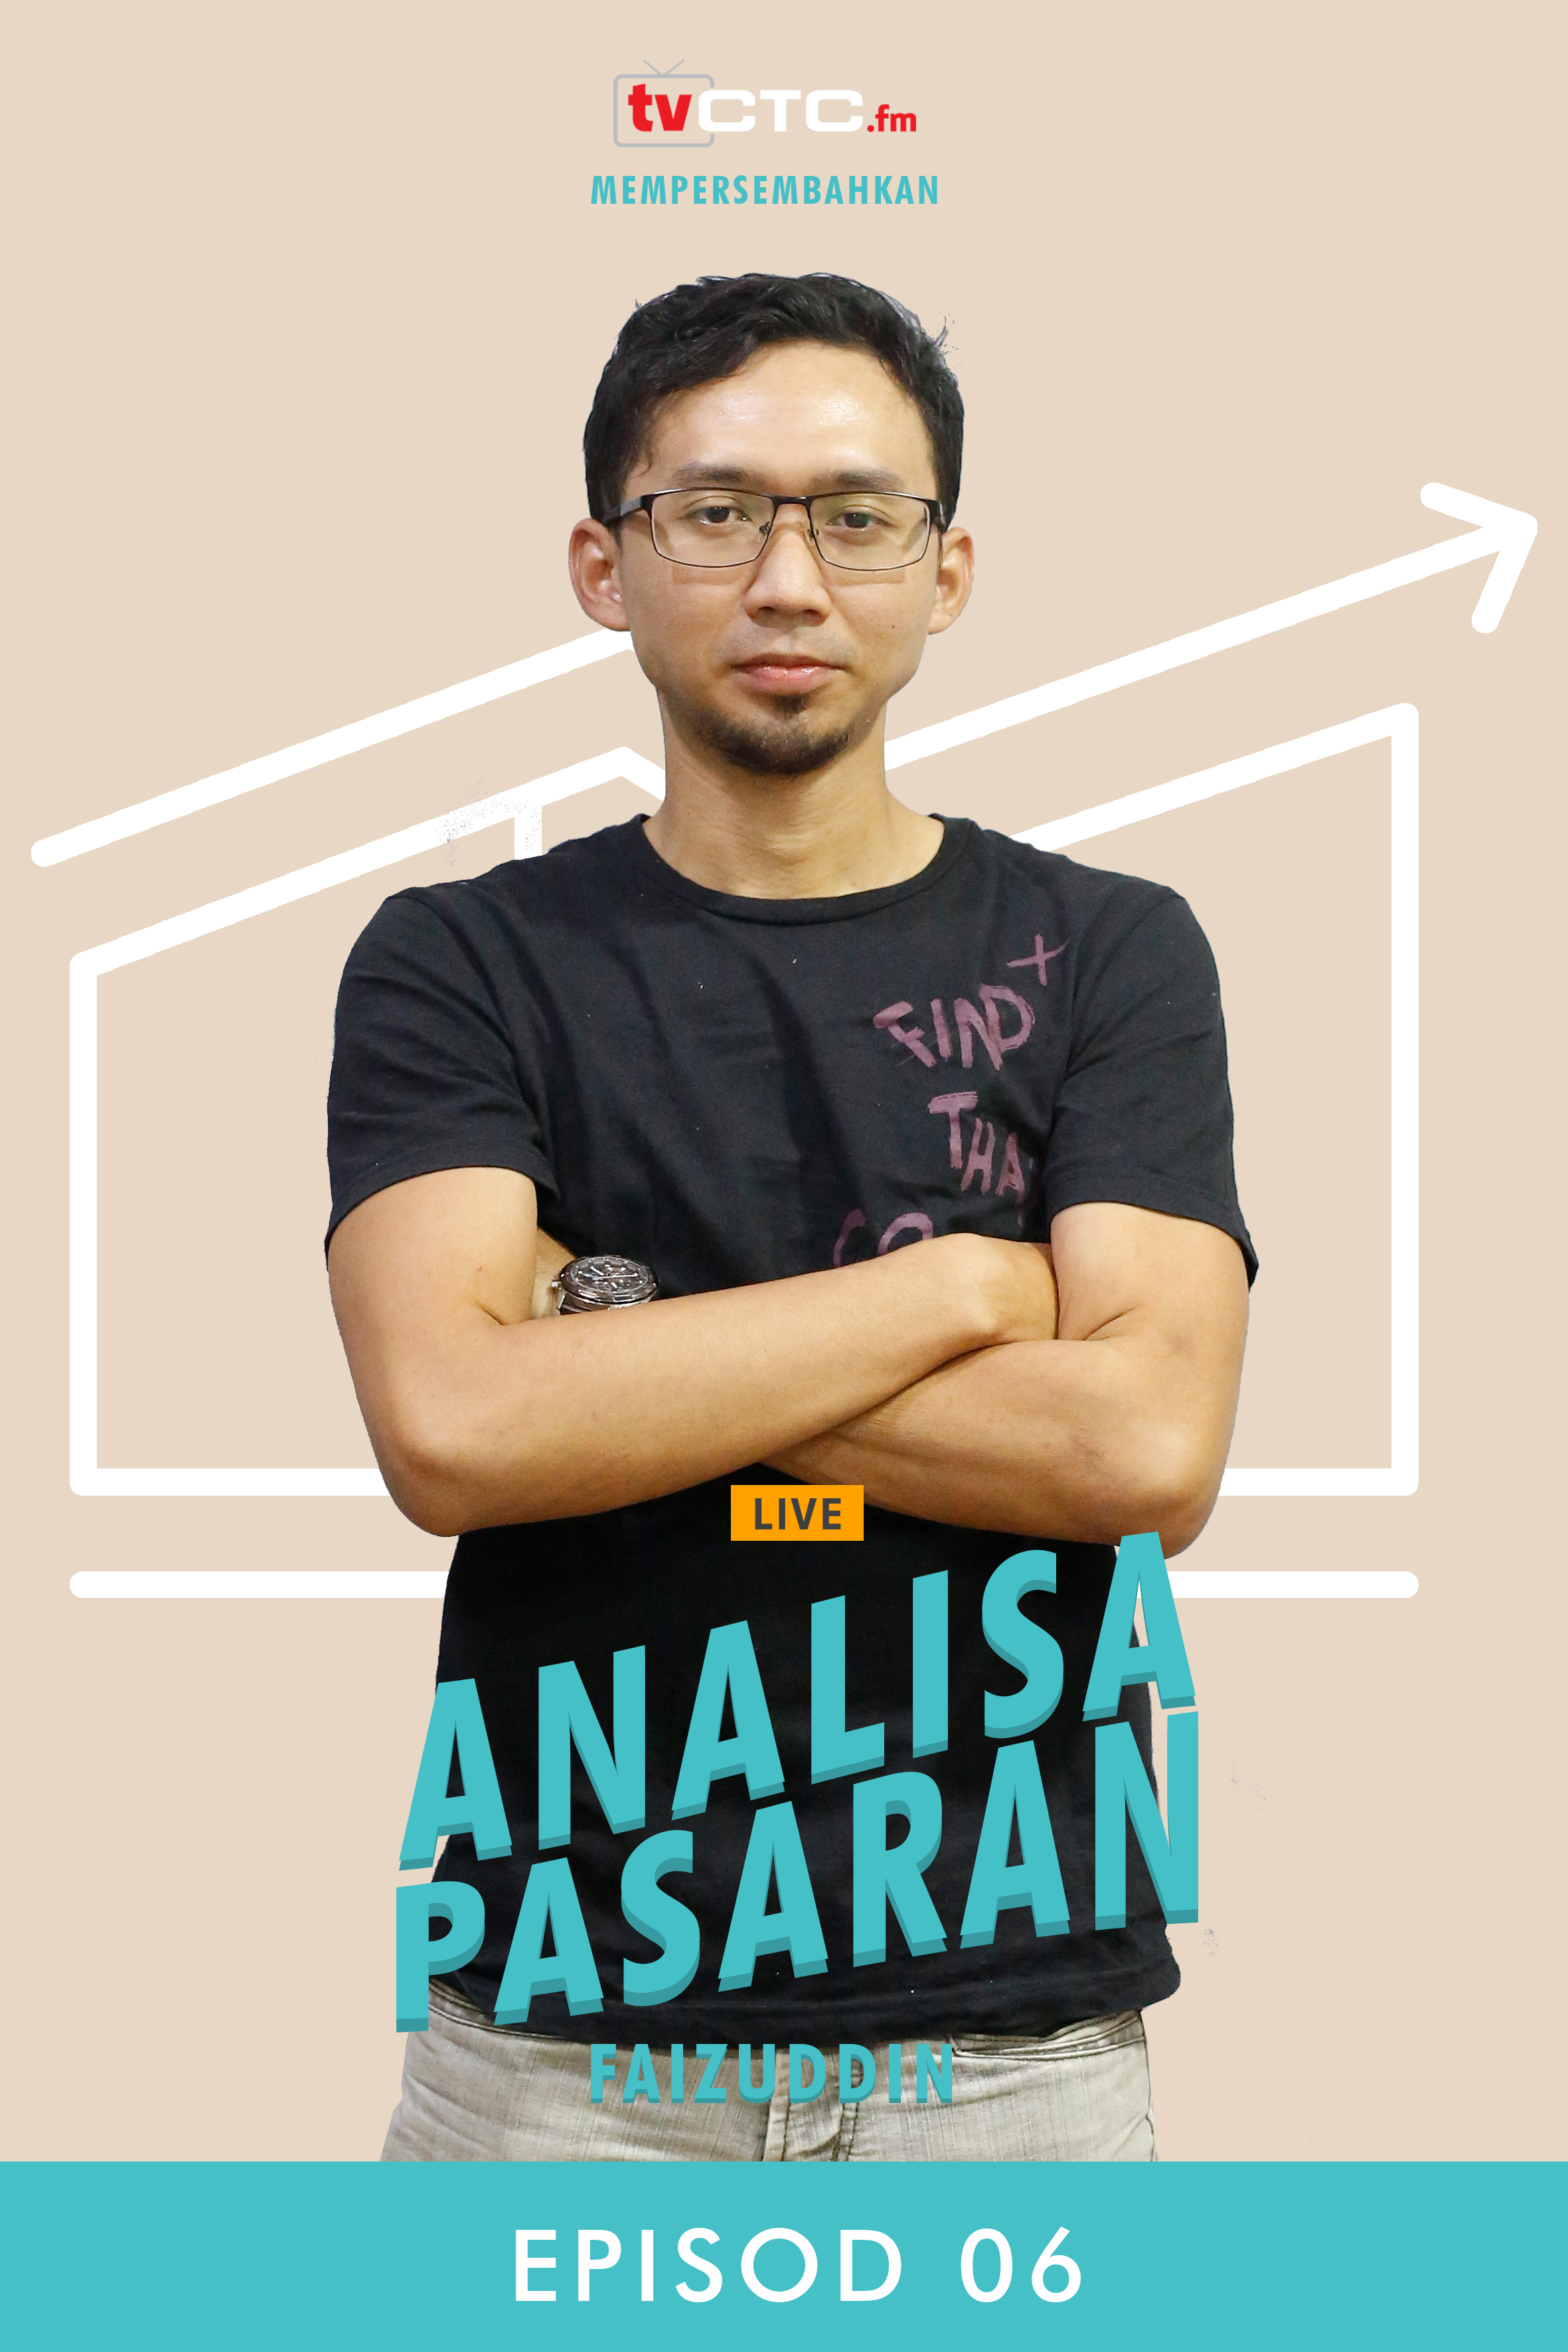 ANALISA PASARAN : Faizuddin (Episod 6)